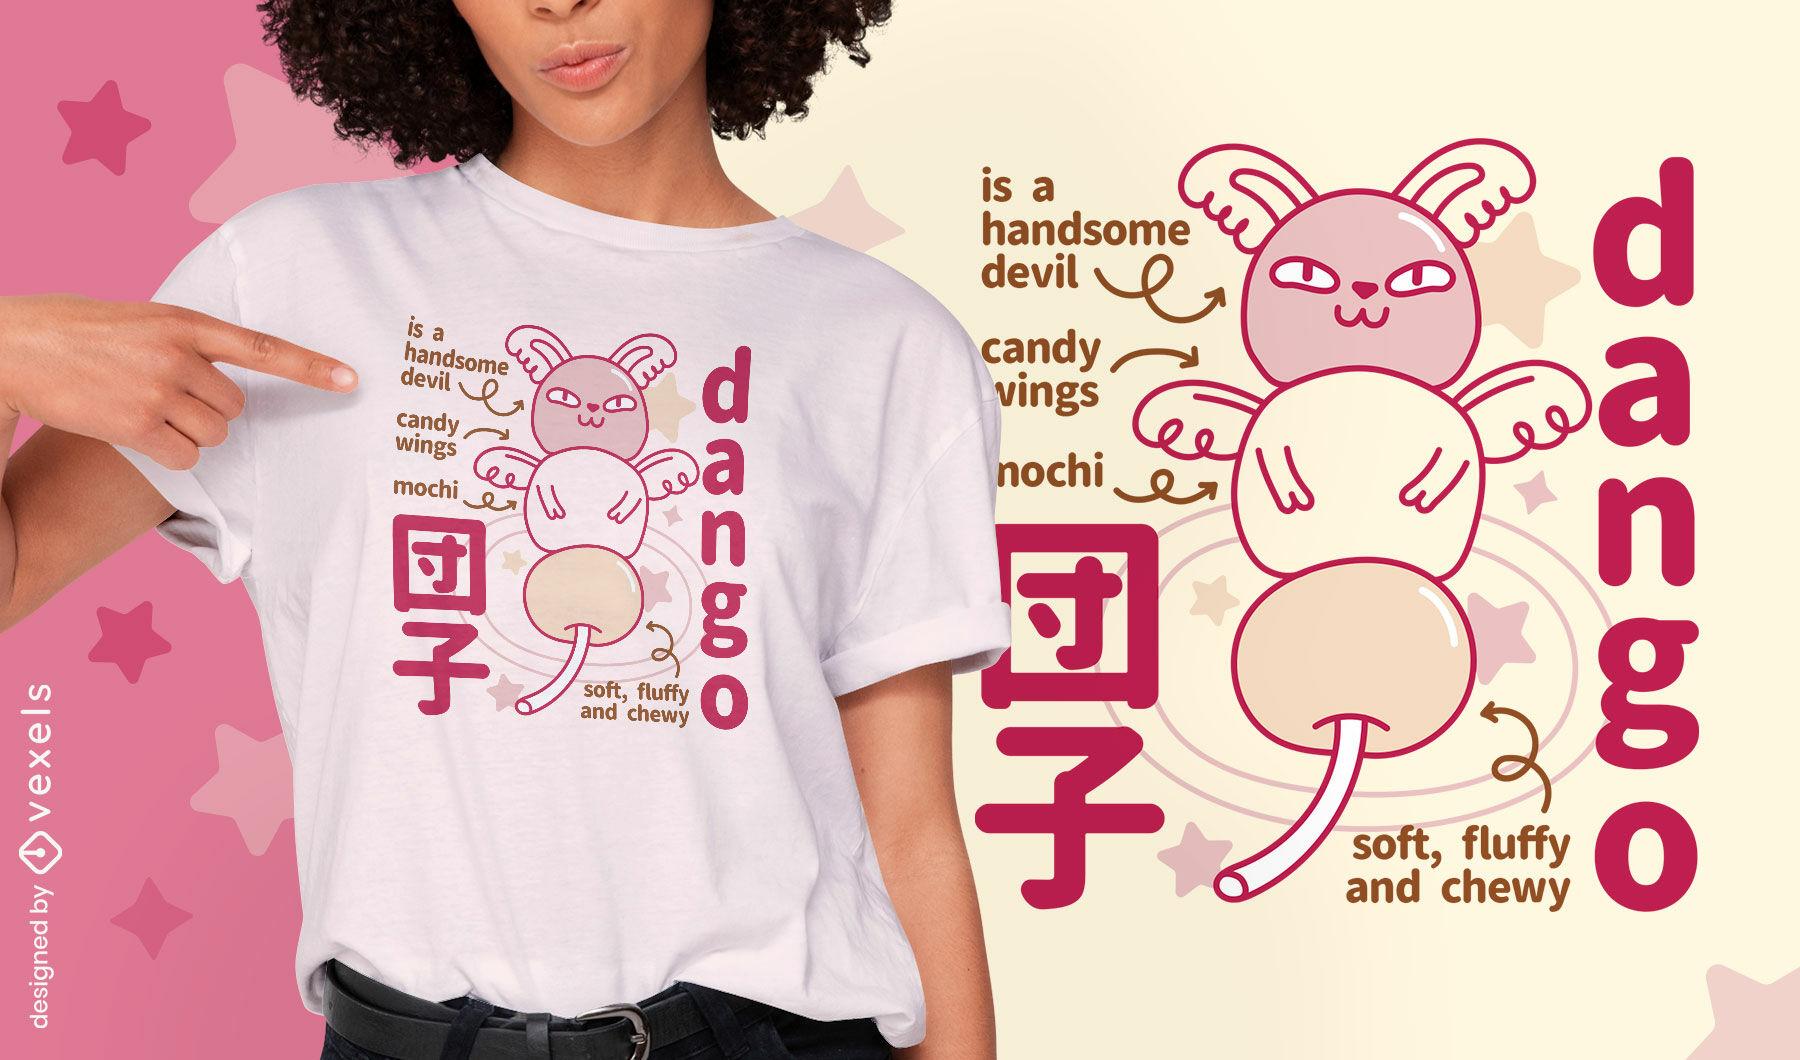 Dise?o de camiseta de monstruo dango japon?s